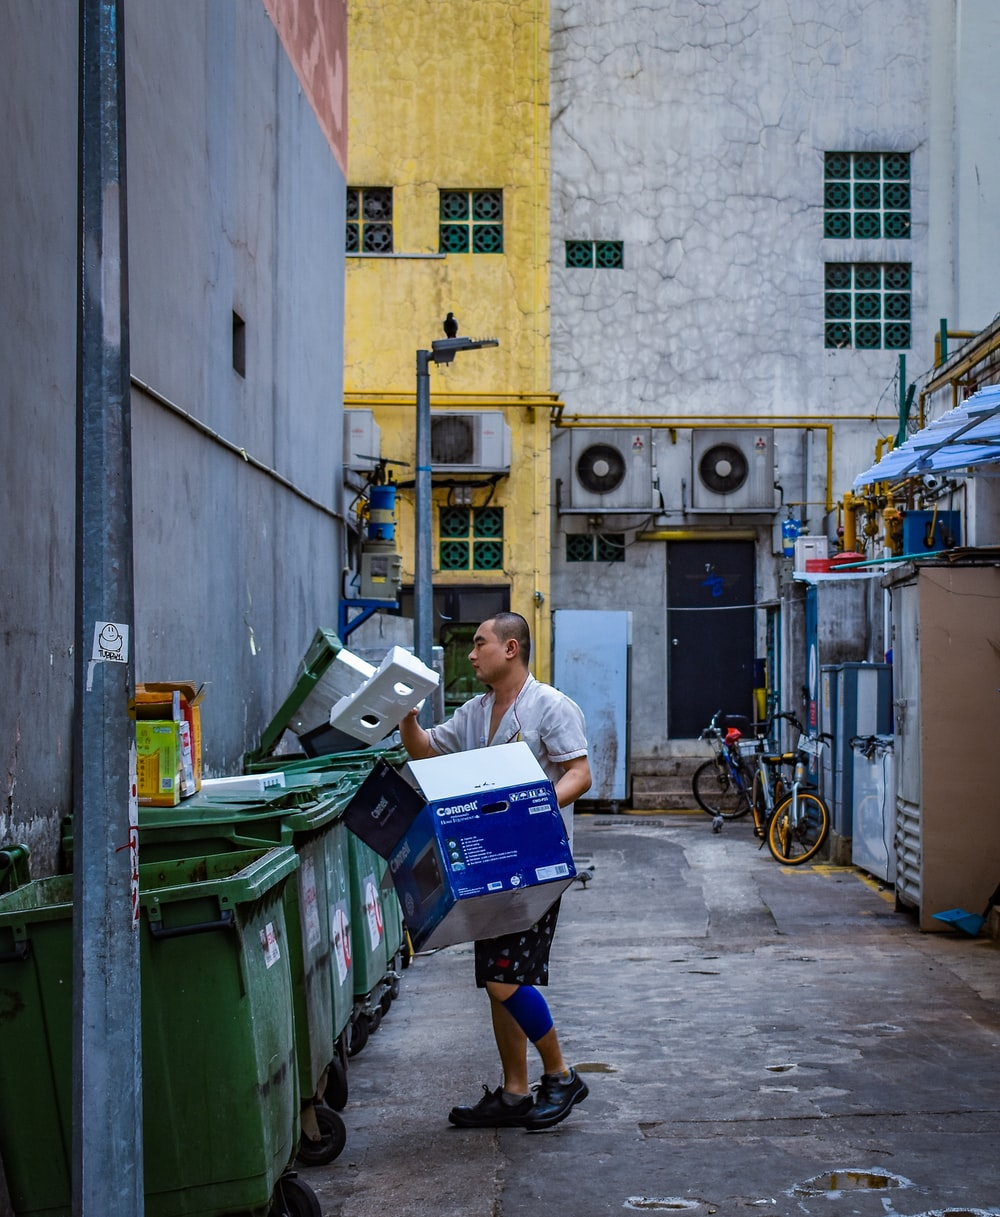 man in gray button-up shirt holding blue box near green garbage bin